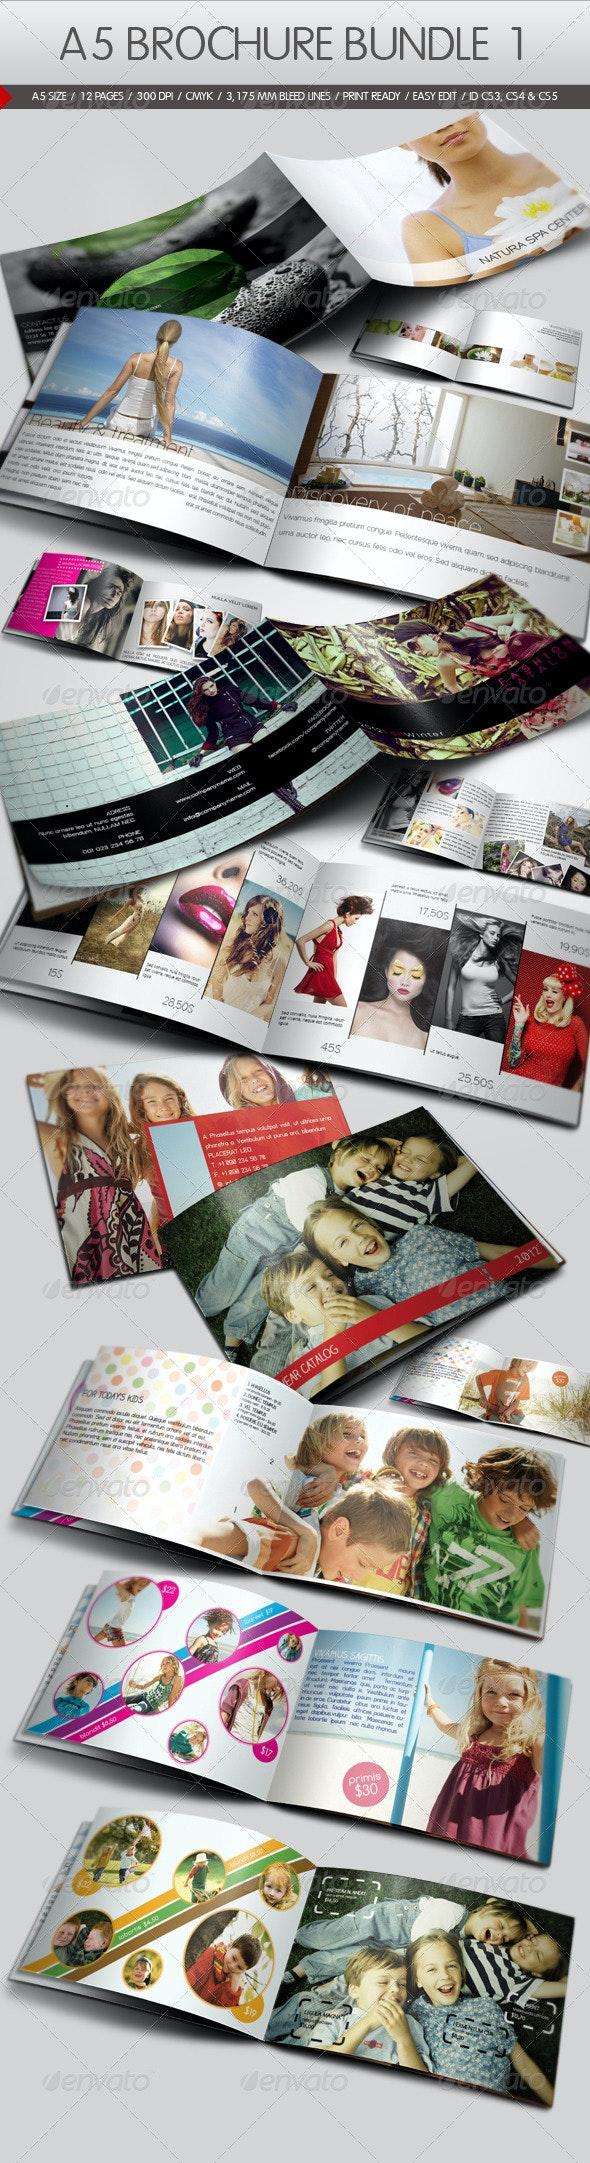 A5 Brochure Bundle I - Corporate Brochures